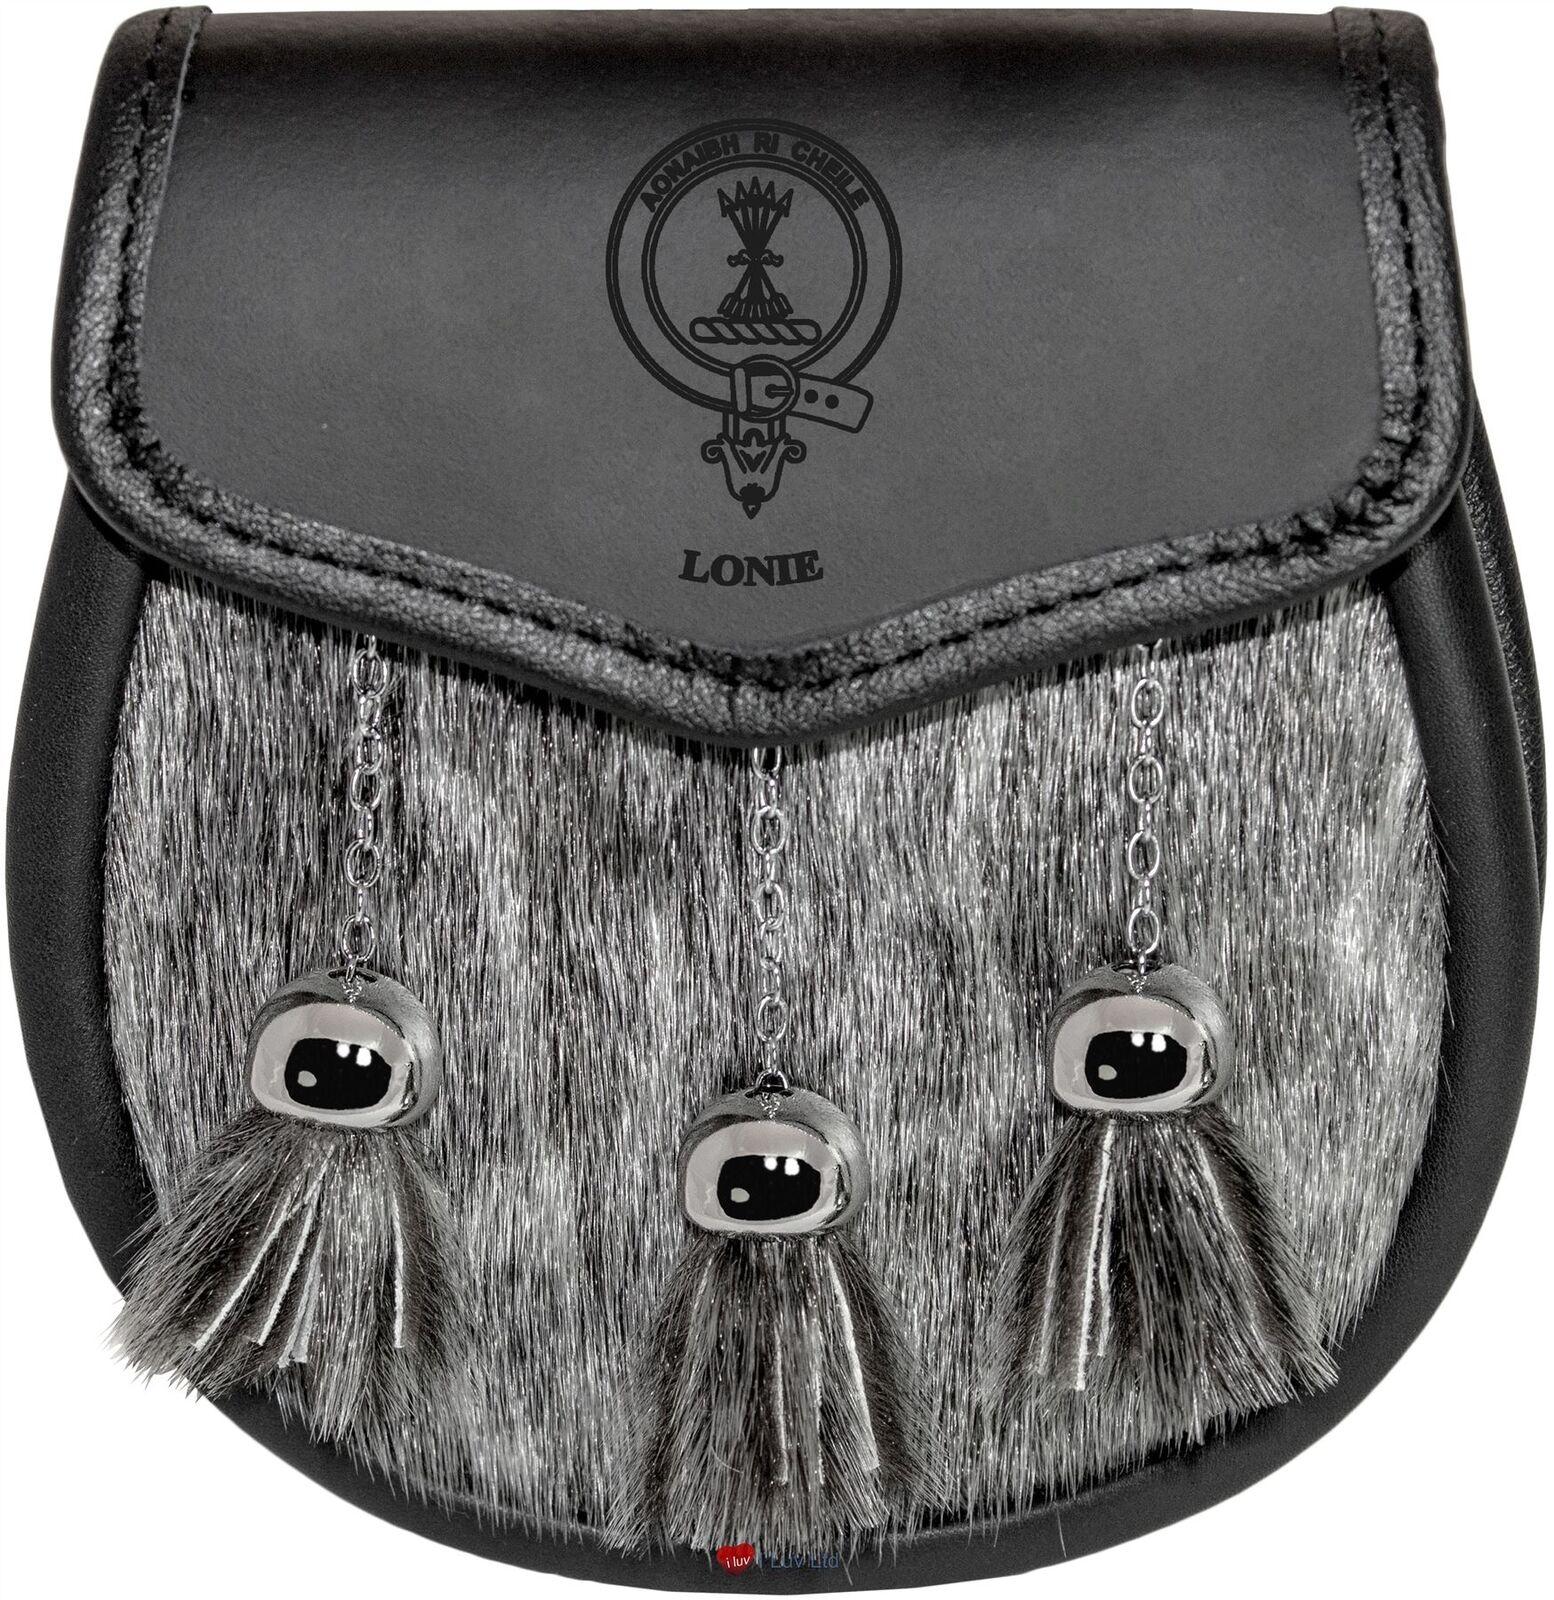 Lonie Semi Dress Sporran Fur Plain Leather Flap Scottish Clan Crest